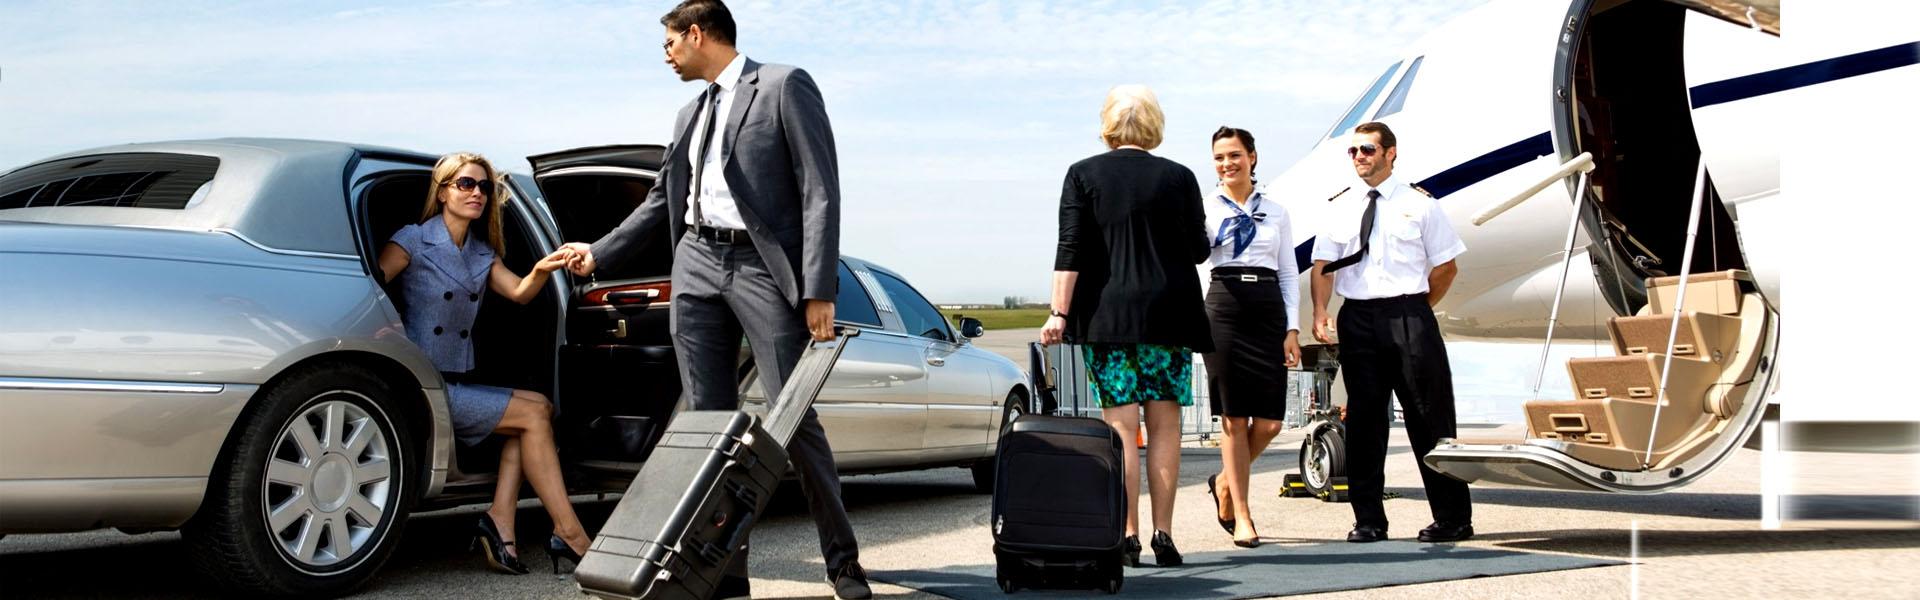 Baiely EZ Transport Airport Services